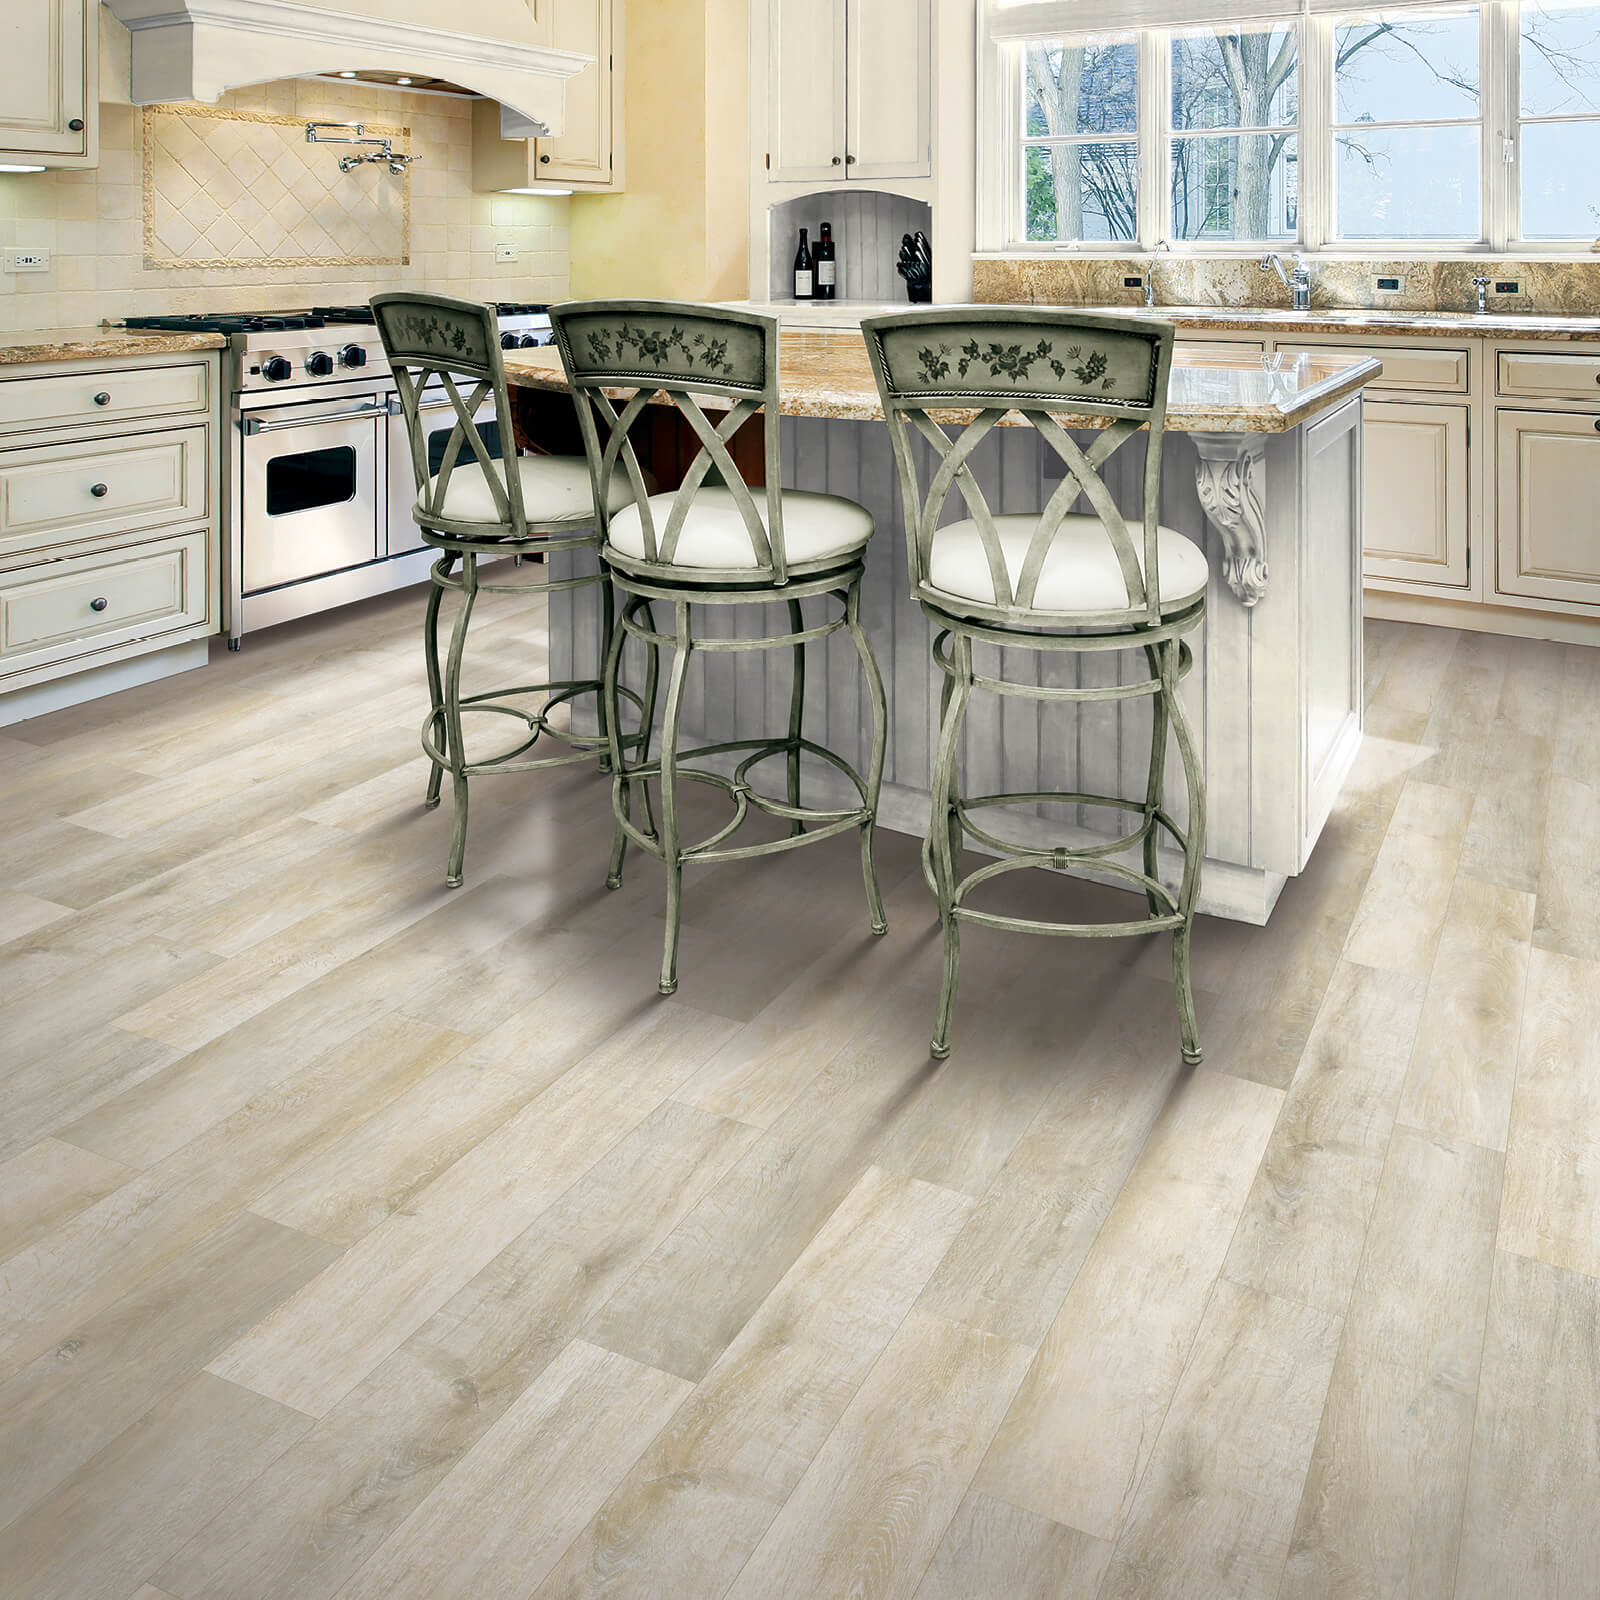 Hardwood Flooring | Wacky's Flooring